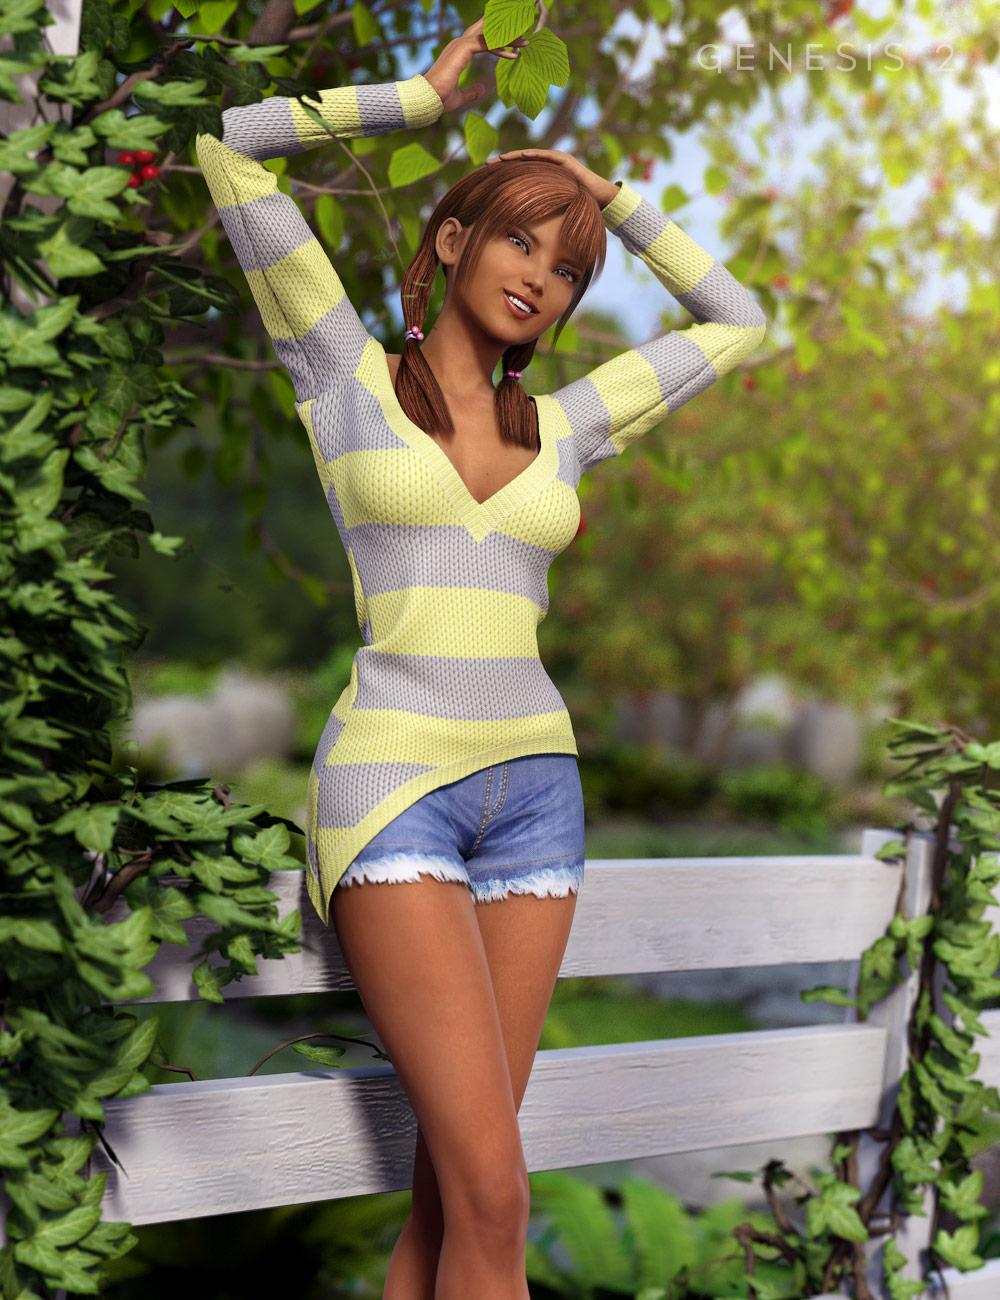 Summer Girl For Genesis 2 Female(s) by: Cute3D, 3D Models by Daz 3D